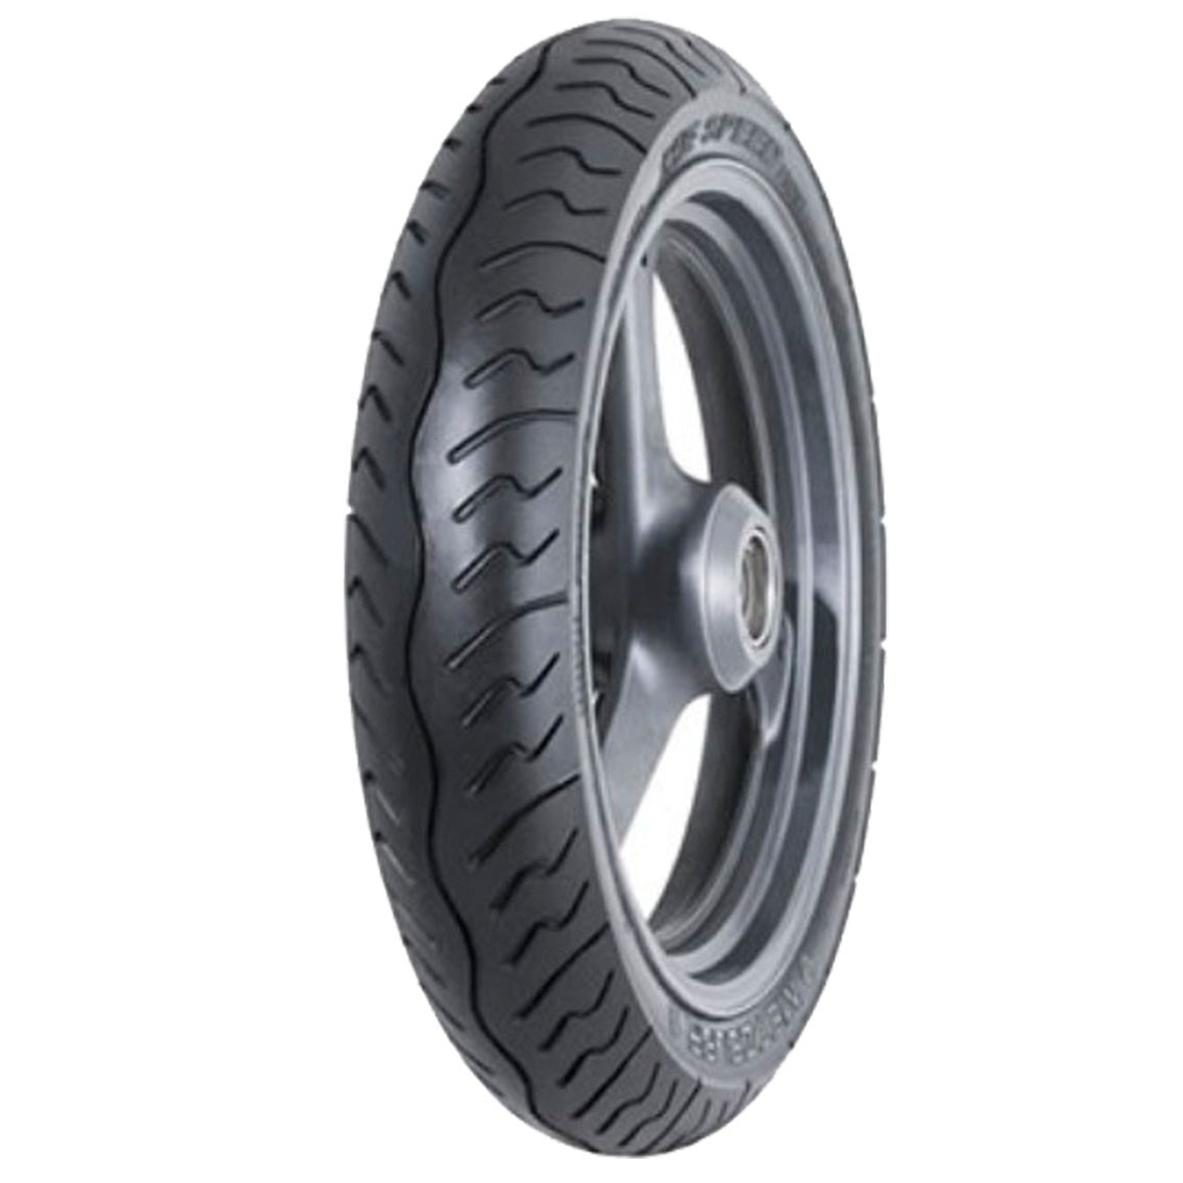 Metzeler ME SPEED 110/70 17 Tubeless 54 H Front Two-Wheeler Tyre